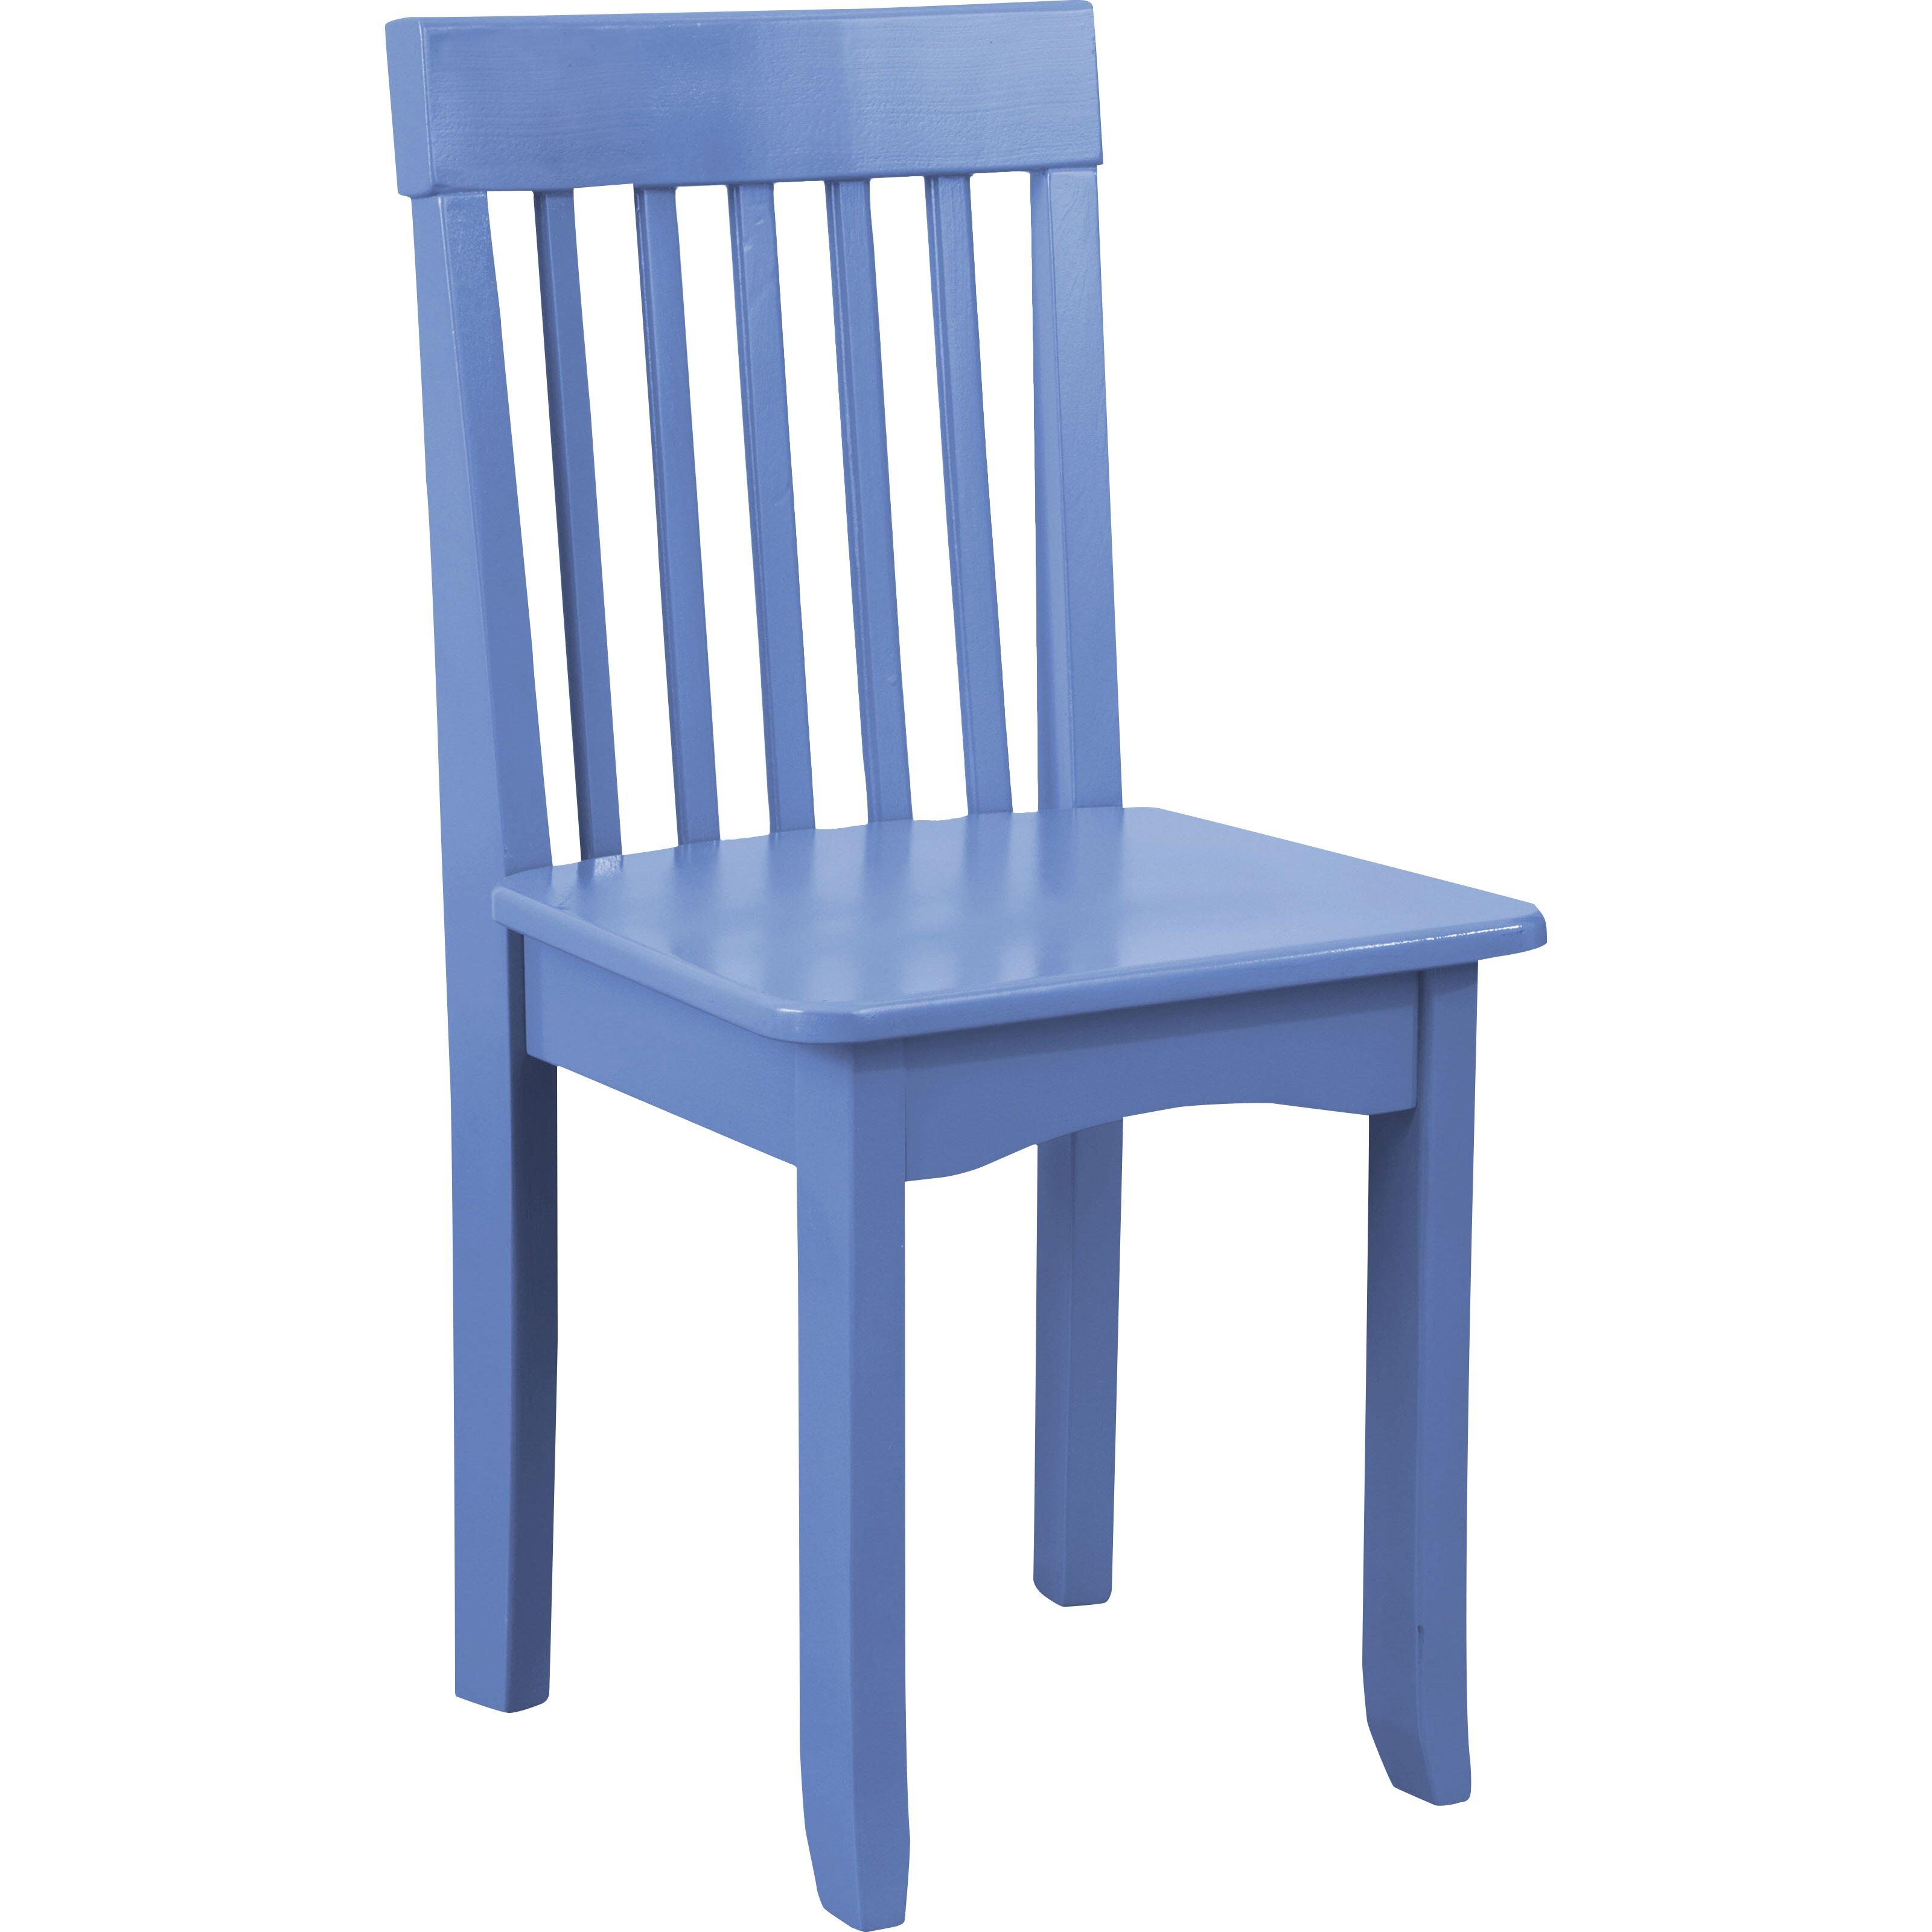 Mariano kids desk chair wayfair - Chaise pour enfant ...